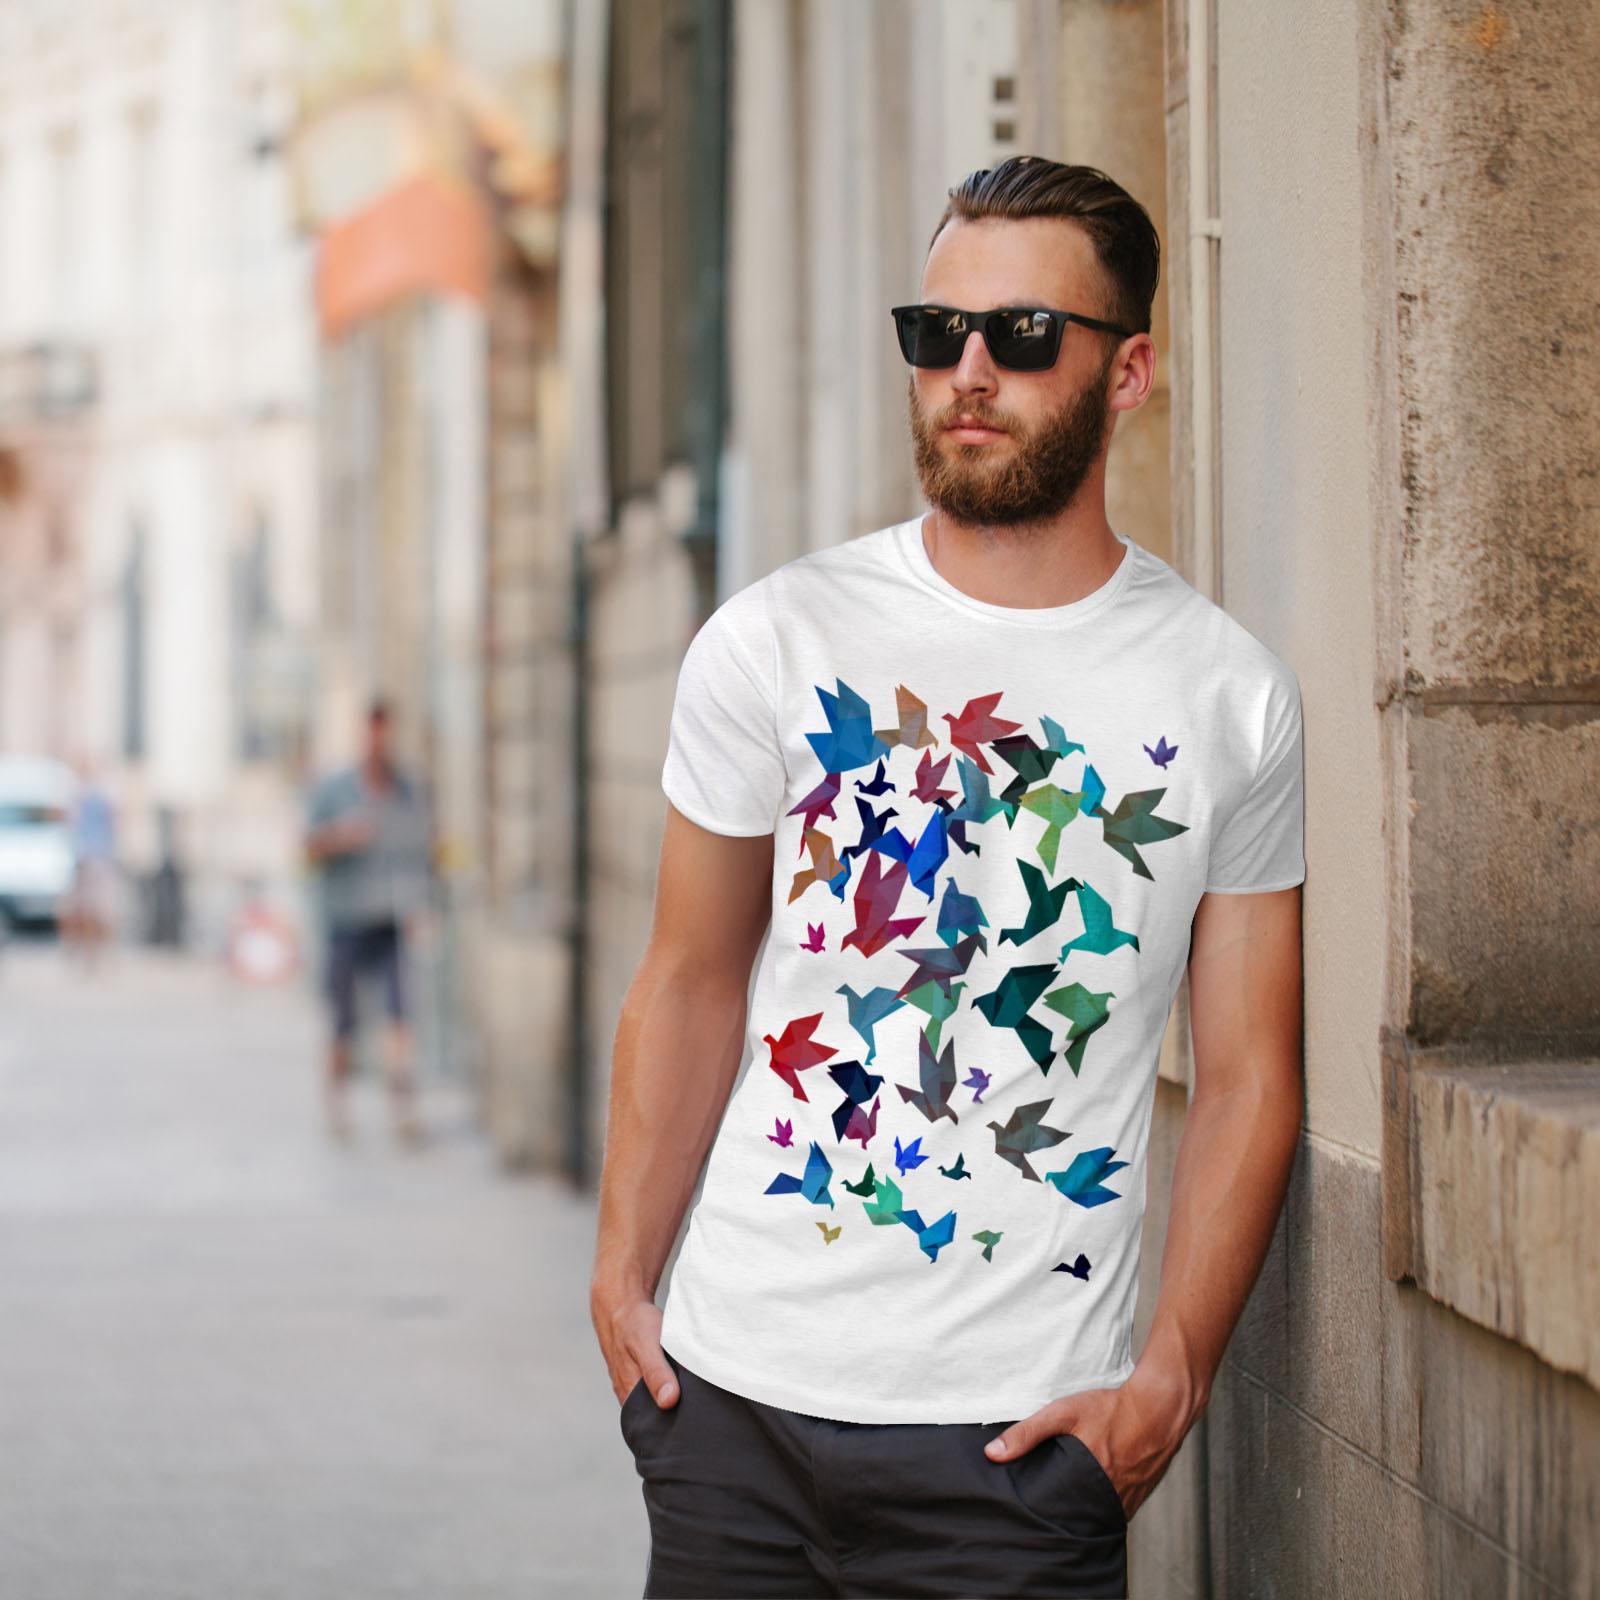 Wellcoda-Origami-Bird-Colors-Mens-T-shirt-Craft-Graphic-Design-Printed-Tee thumbnail 11